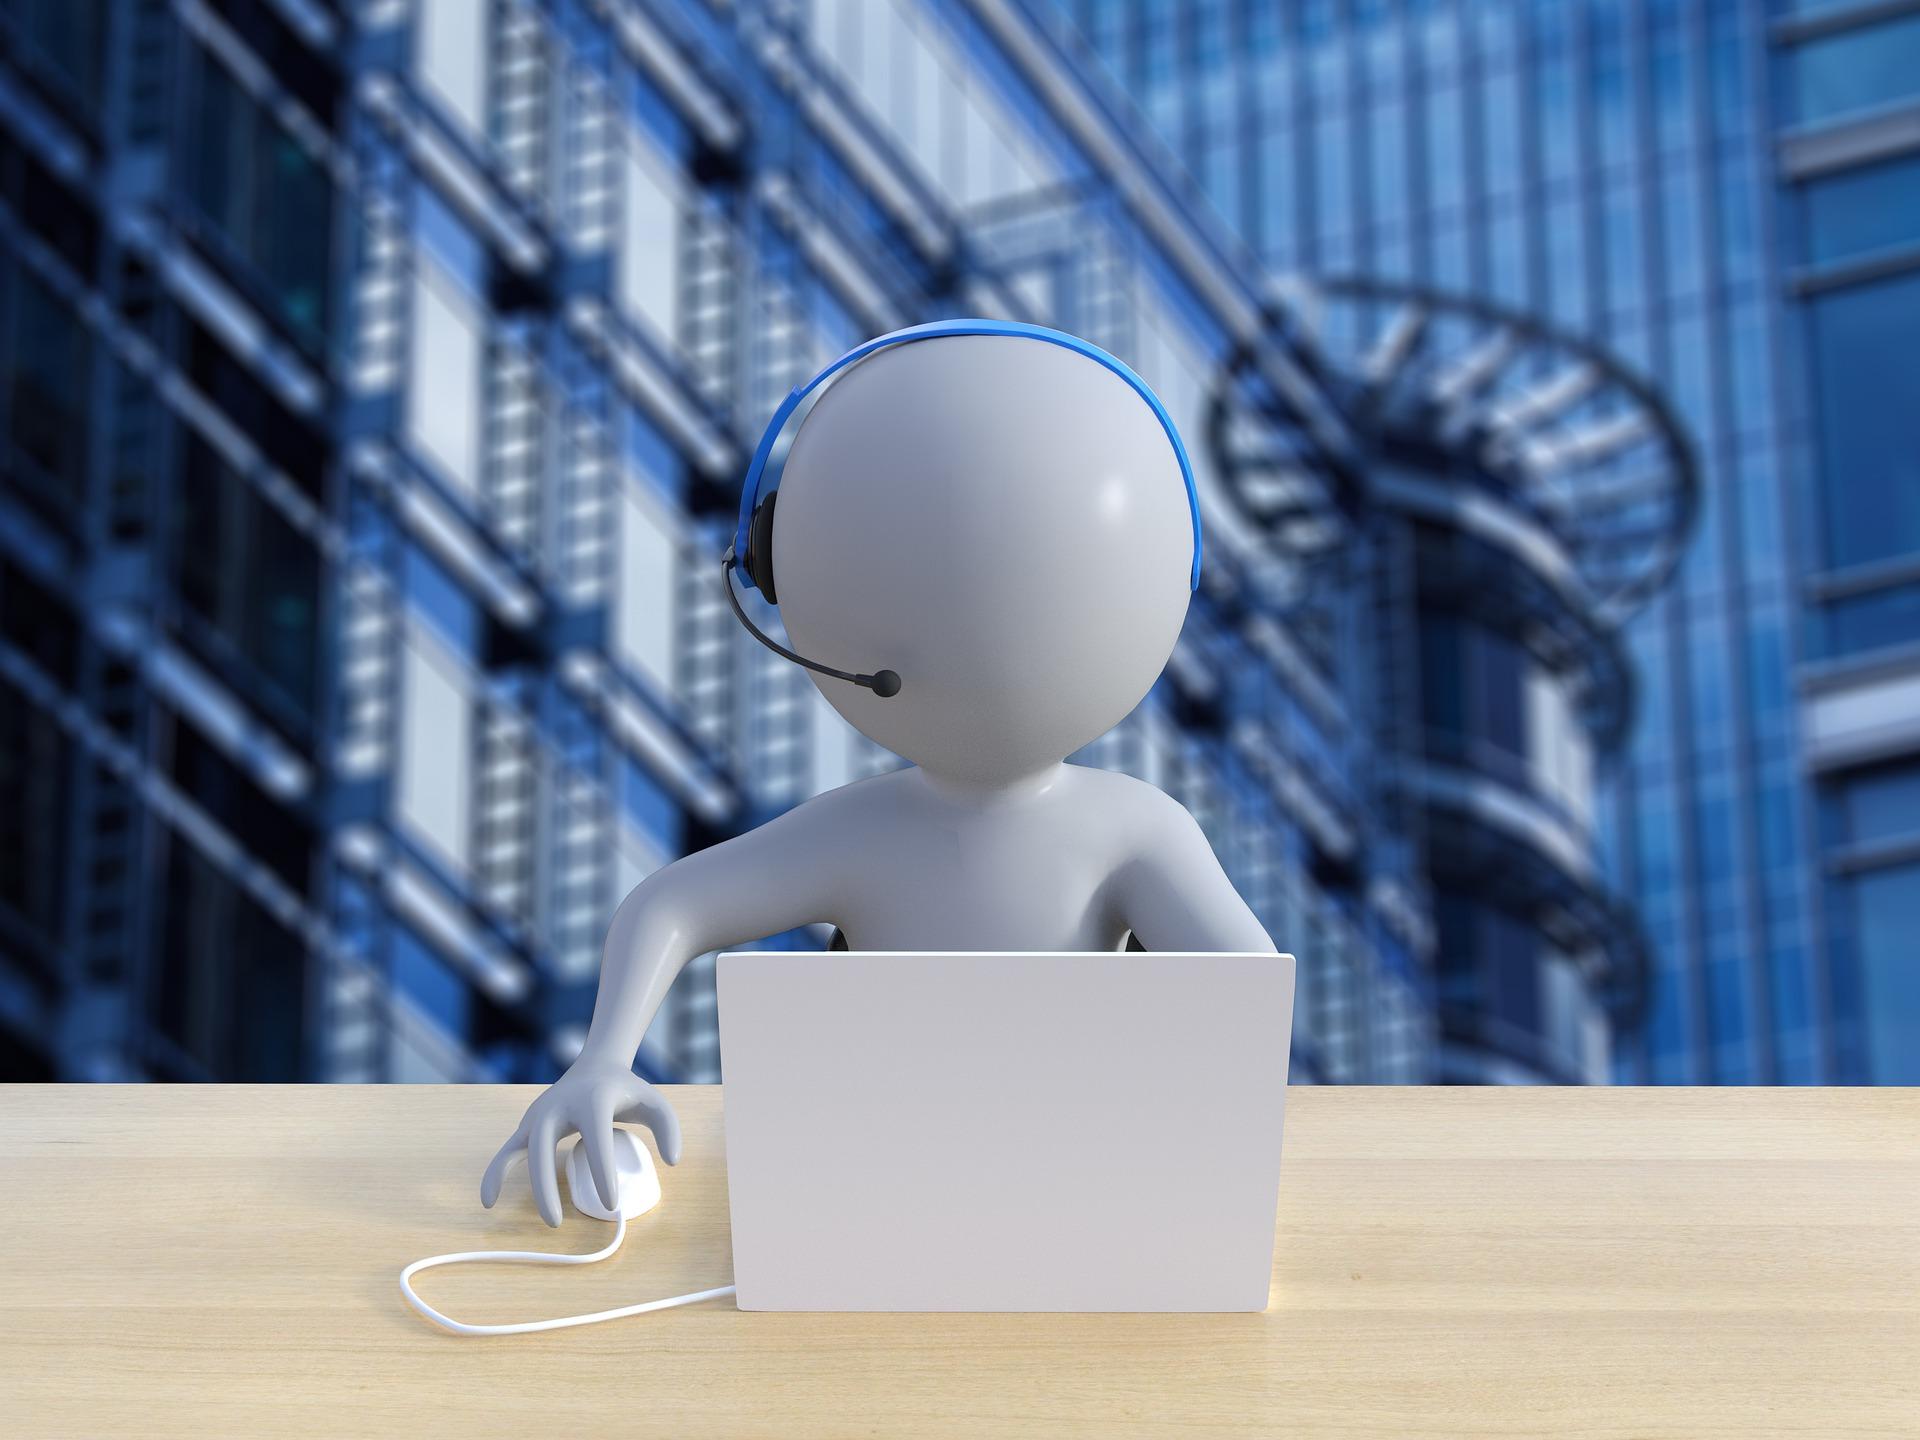 469-200-1807 IRS Suspension Social Security Number Scam Calls